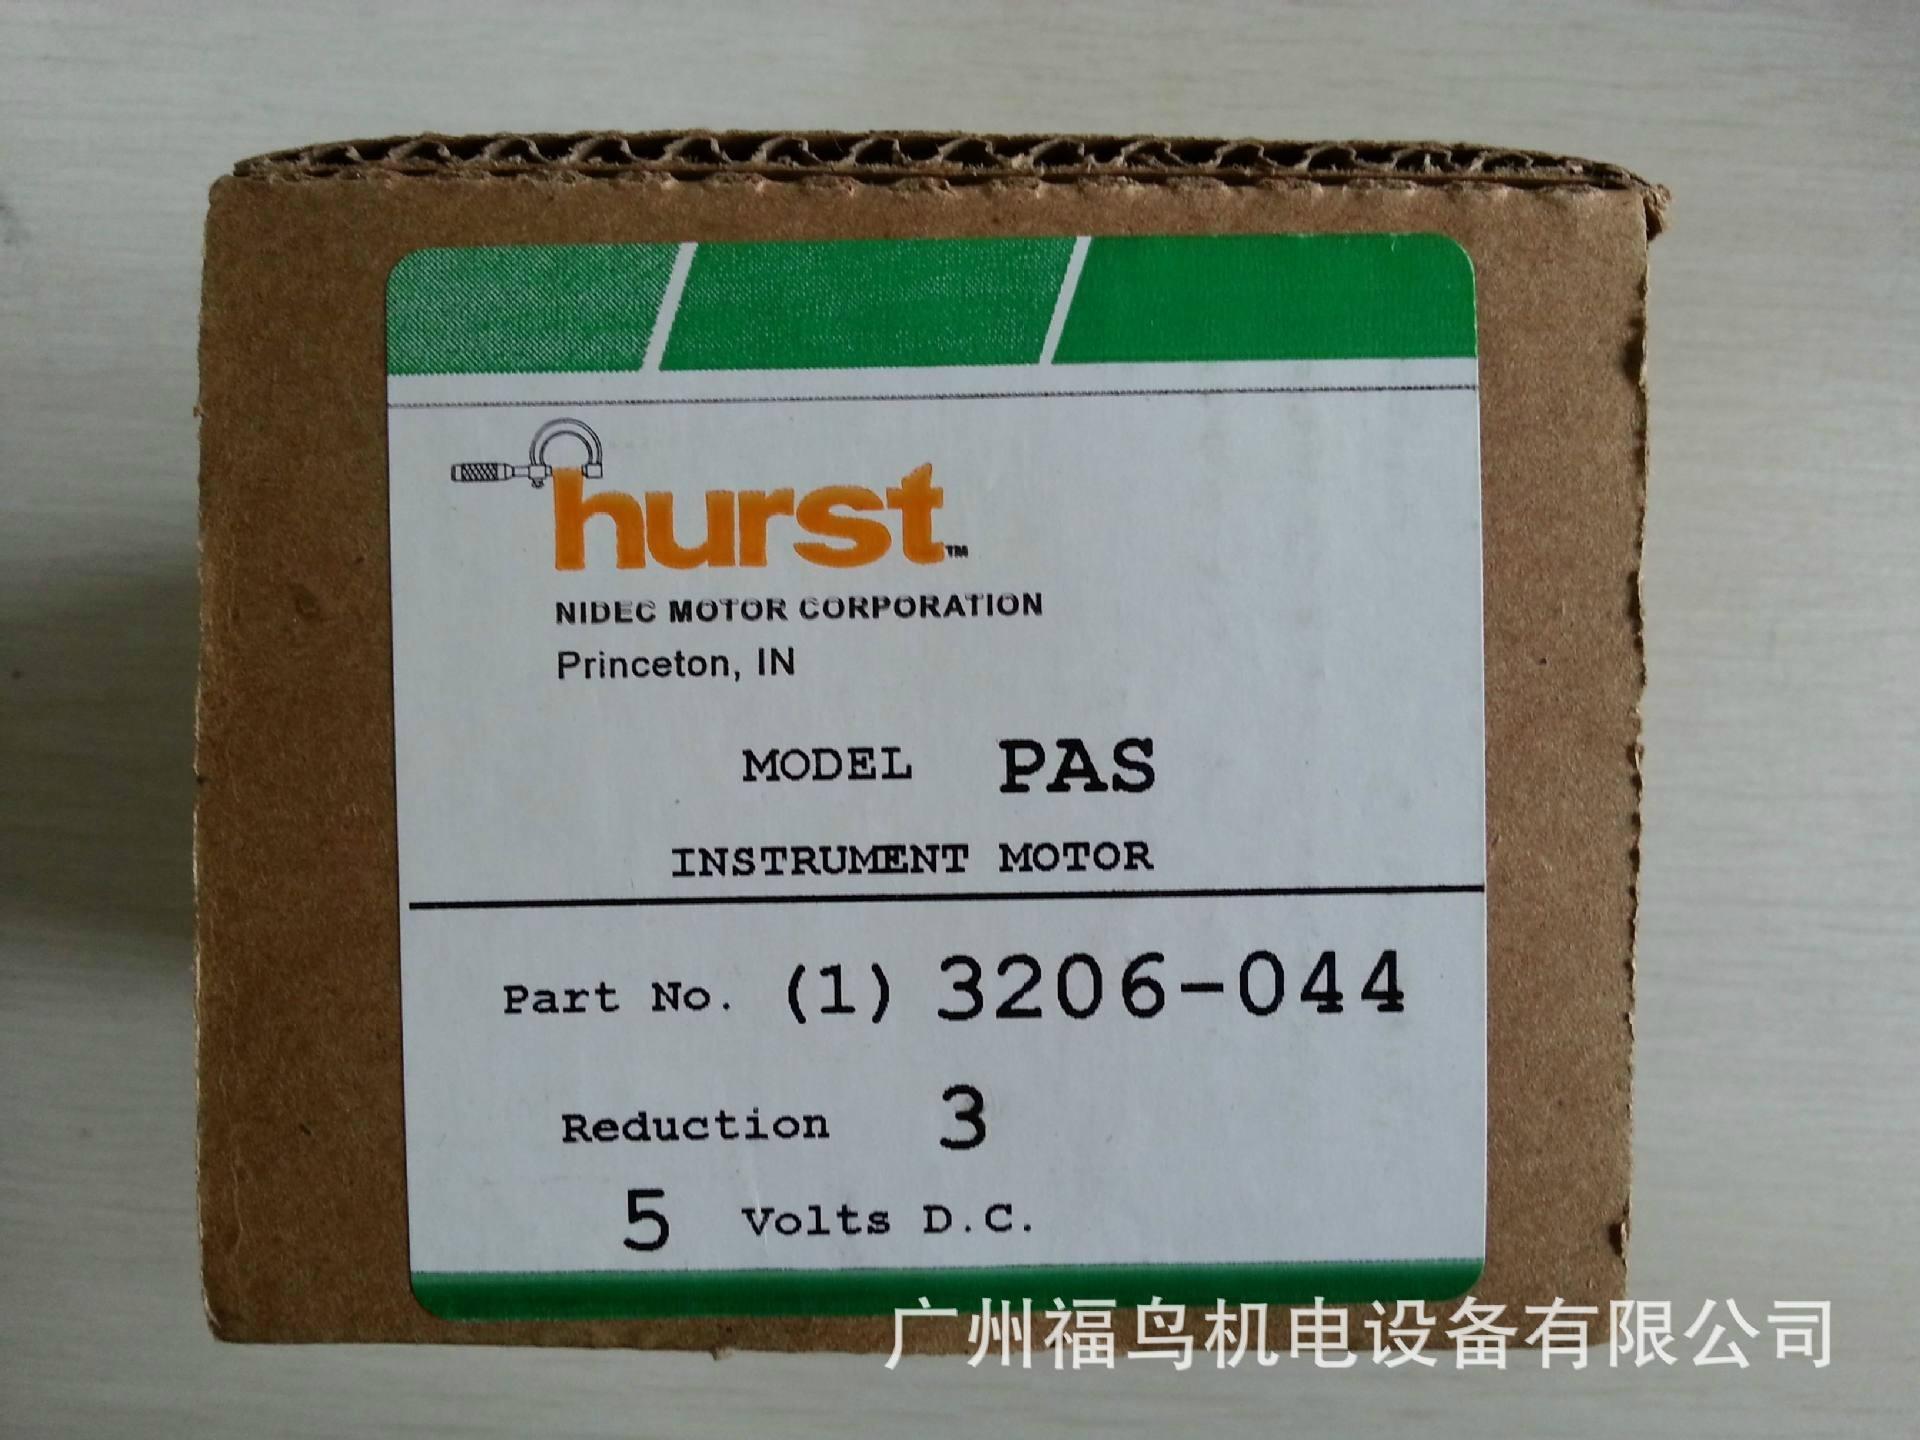 HURST马达, 电机, 订货号: 3206-044